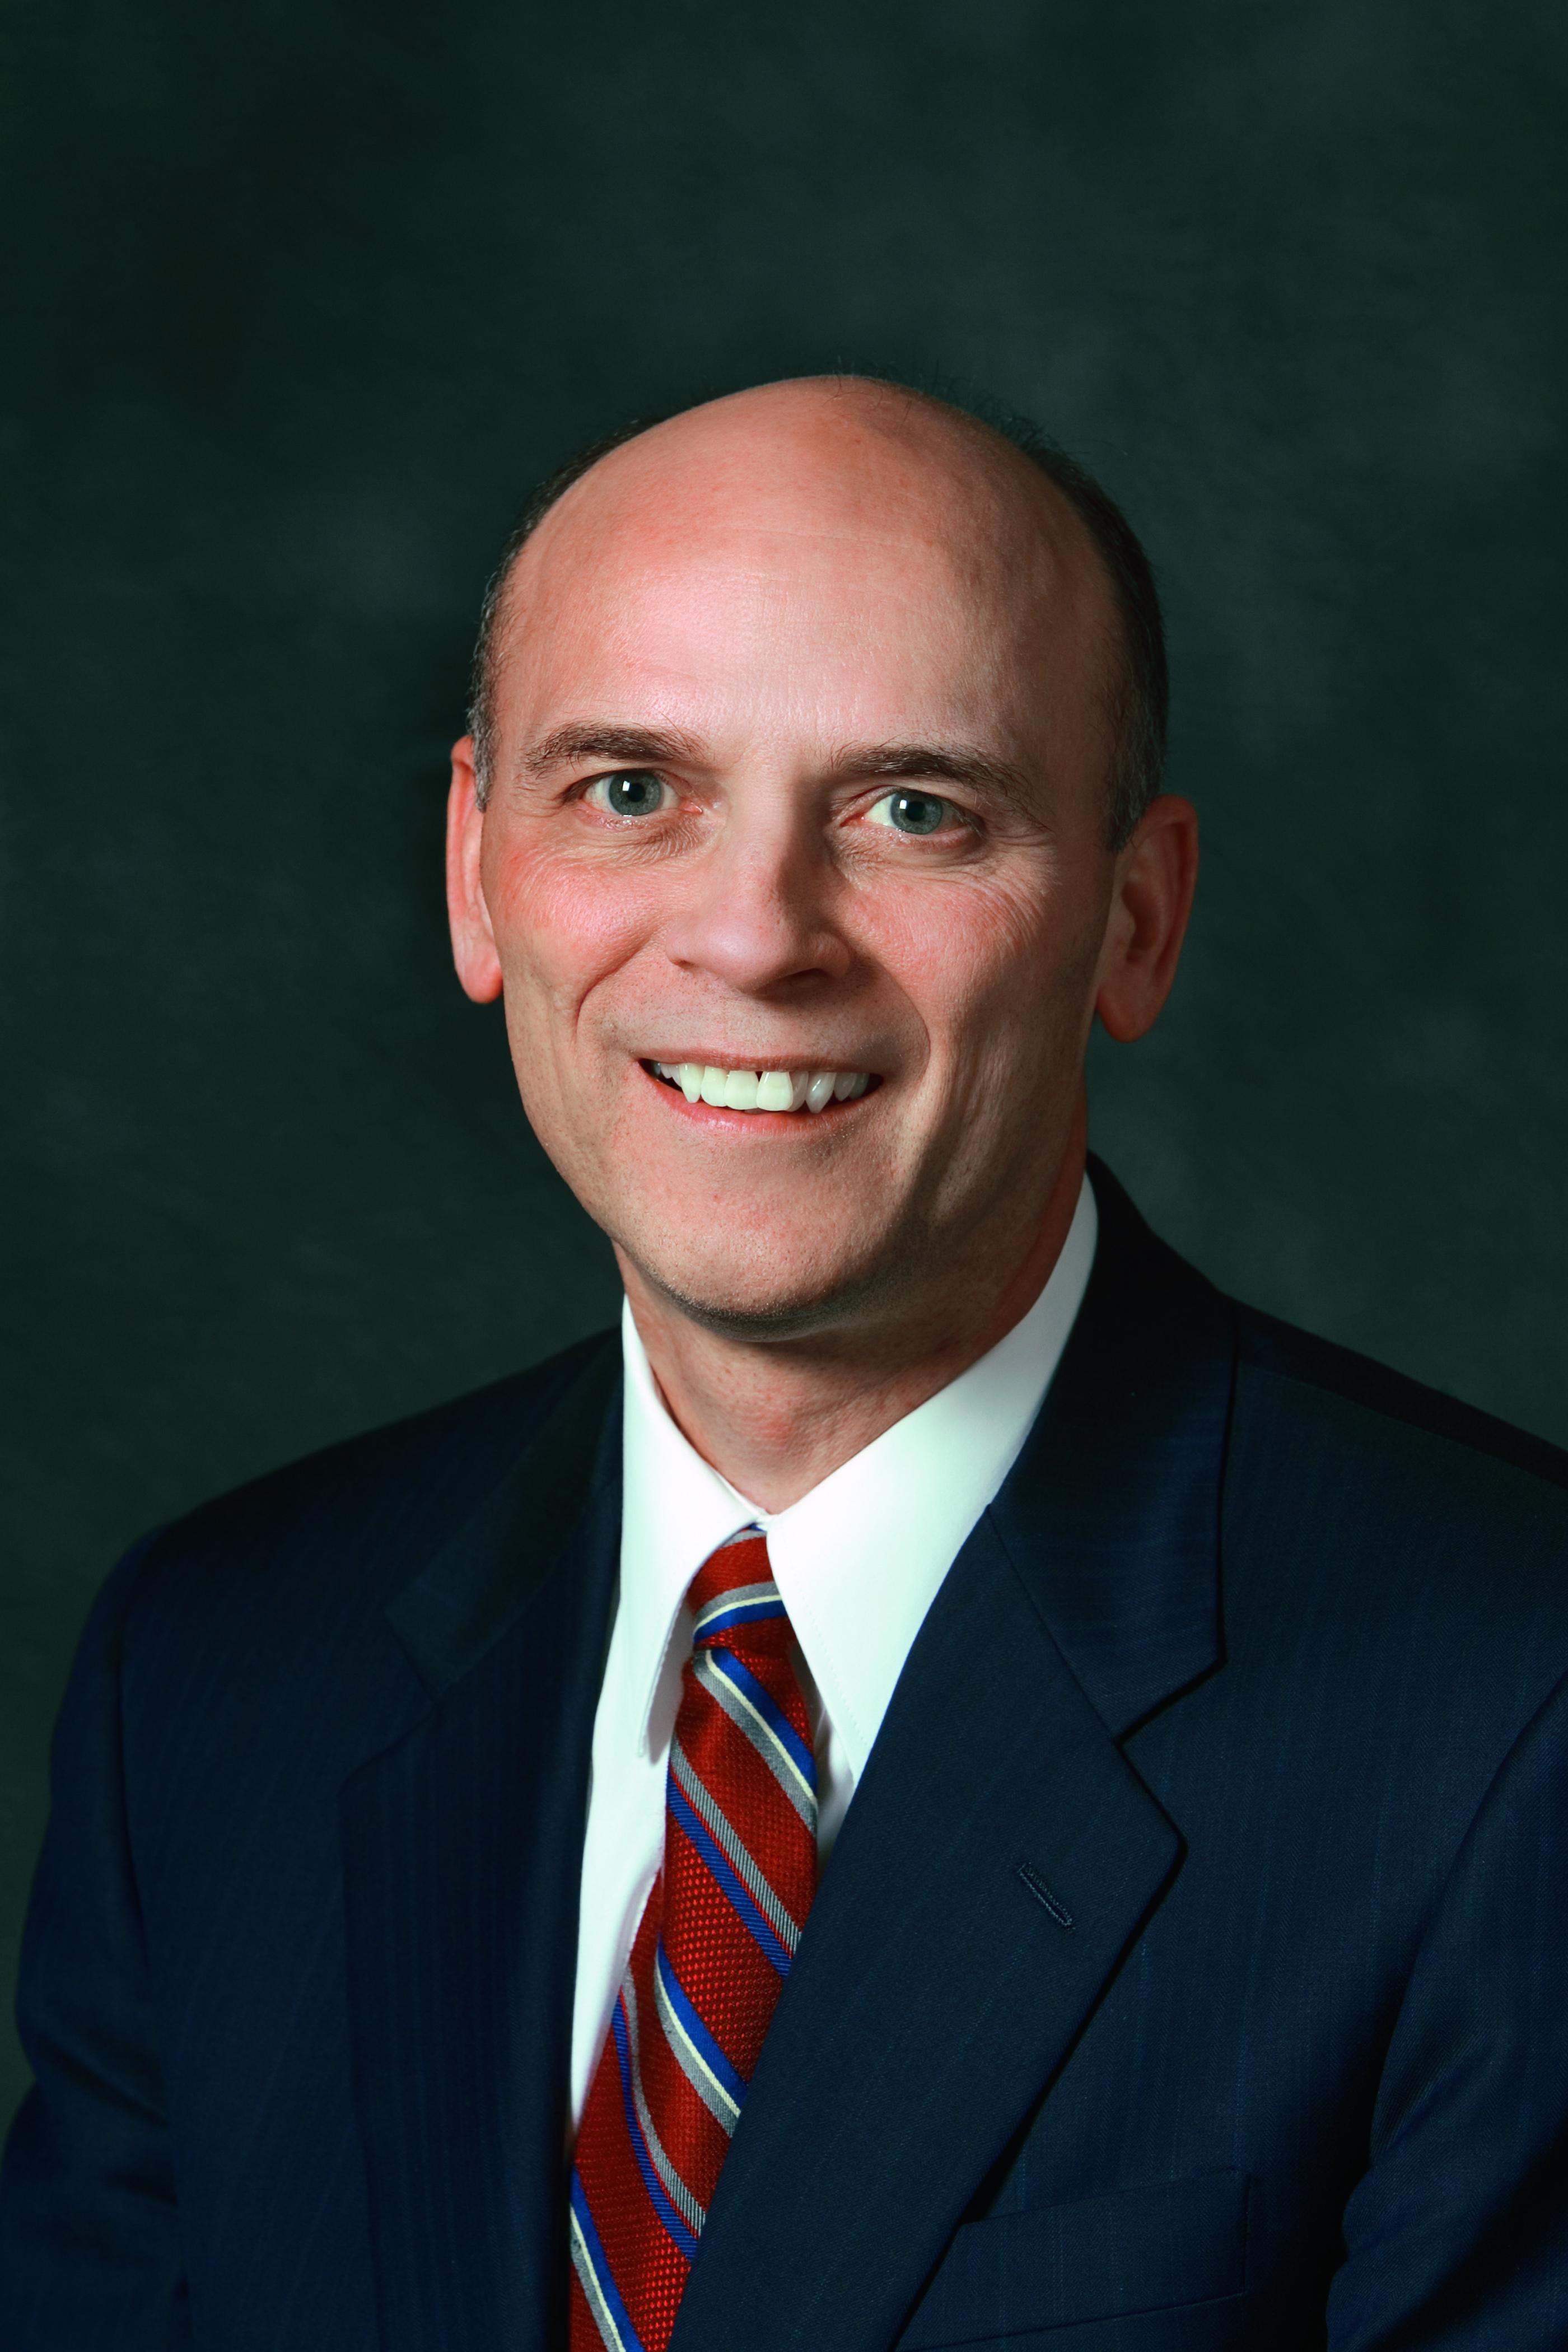 Elder C. Scott Grow, emeritus General Authority Seventy